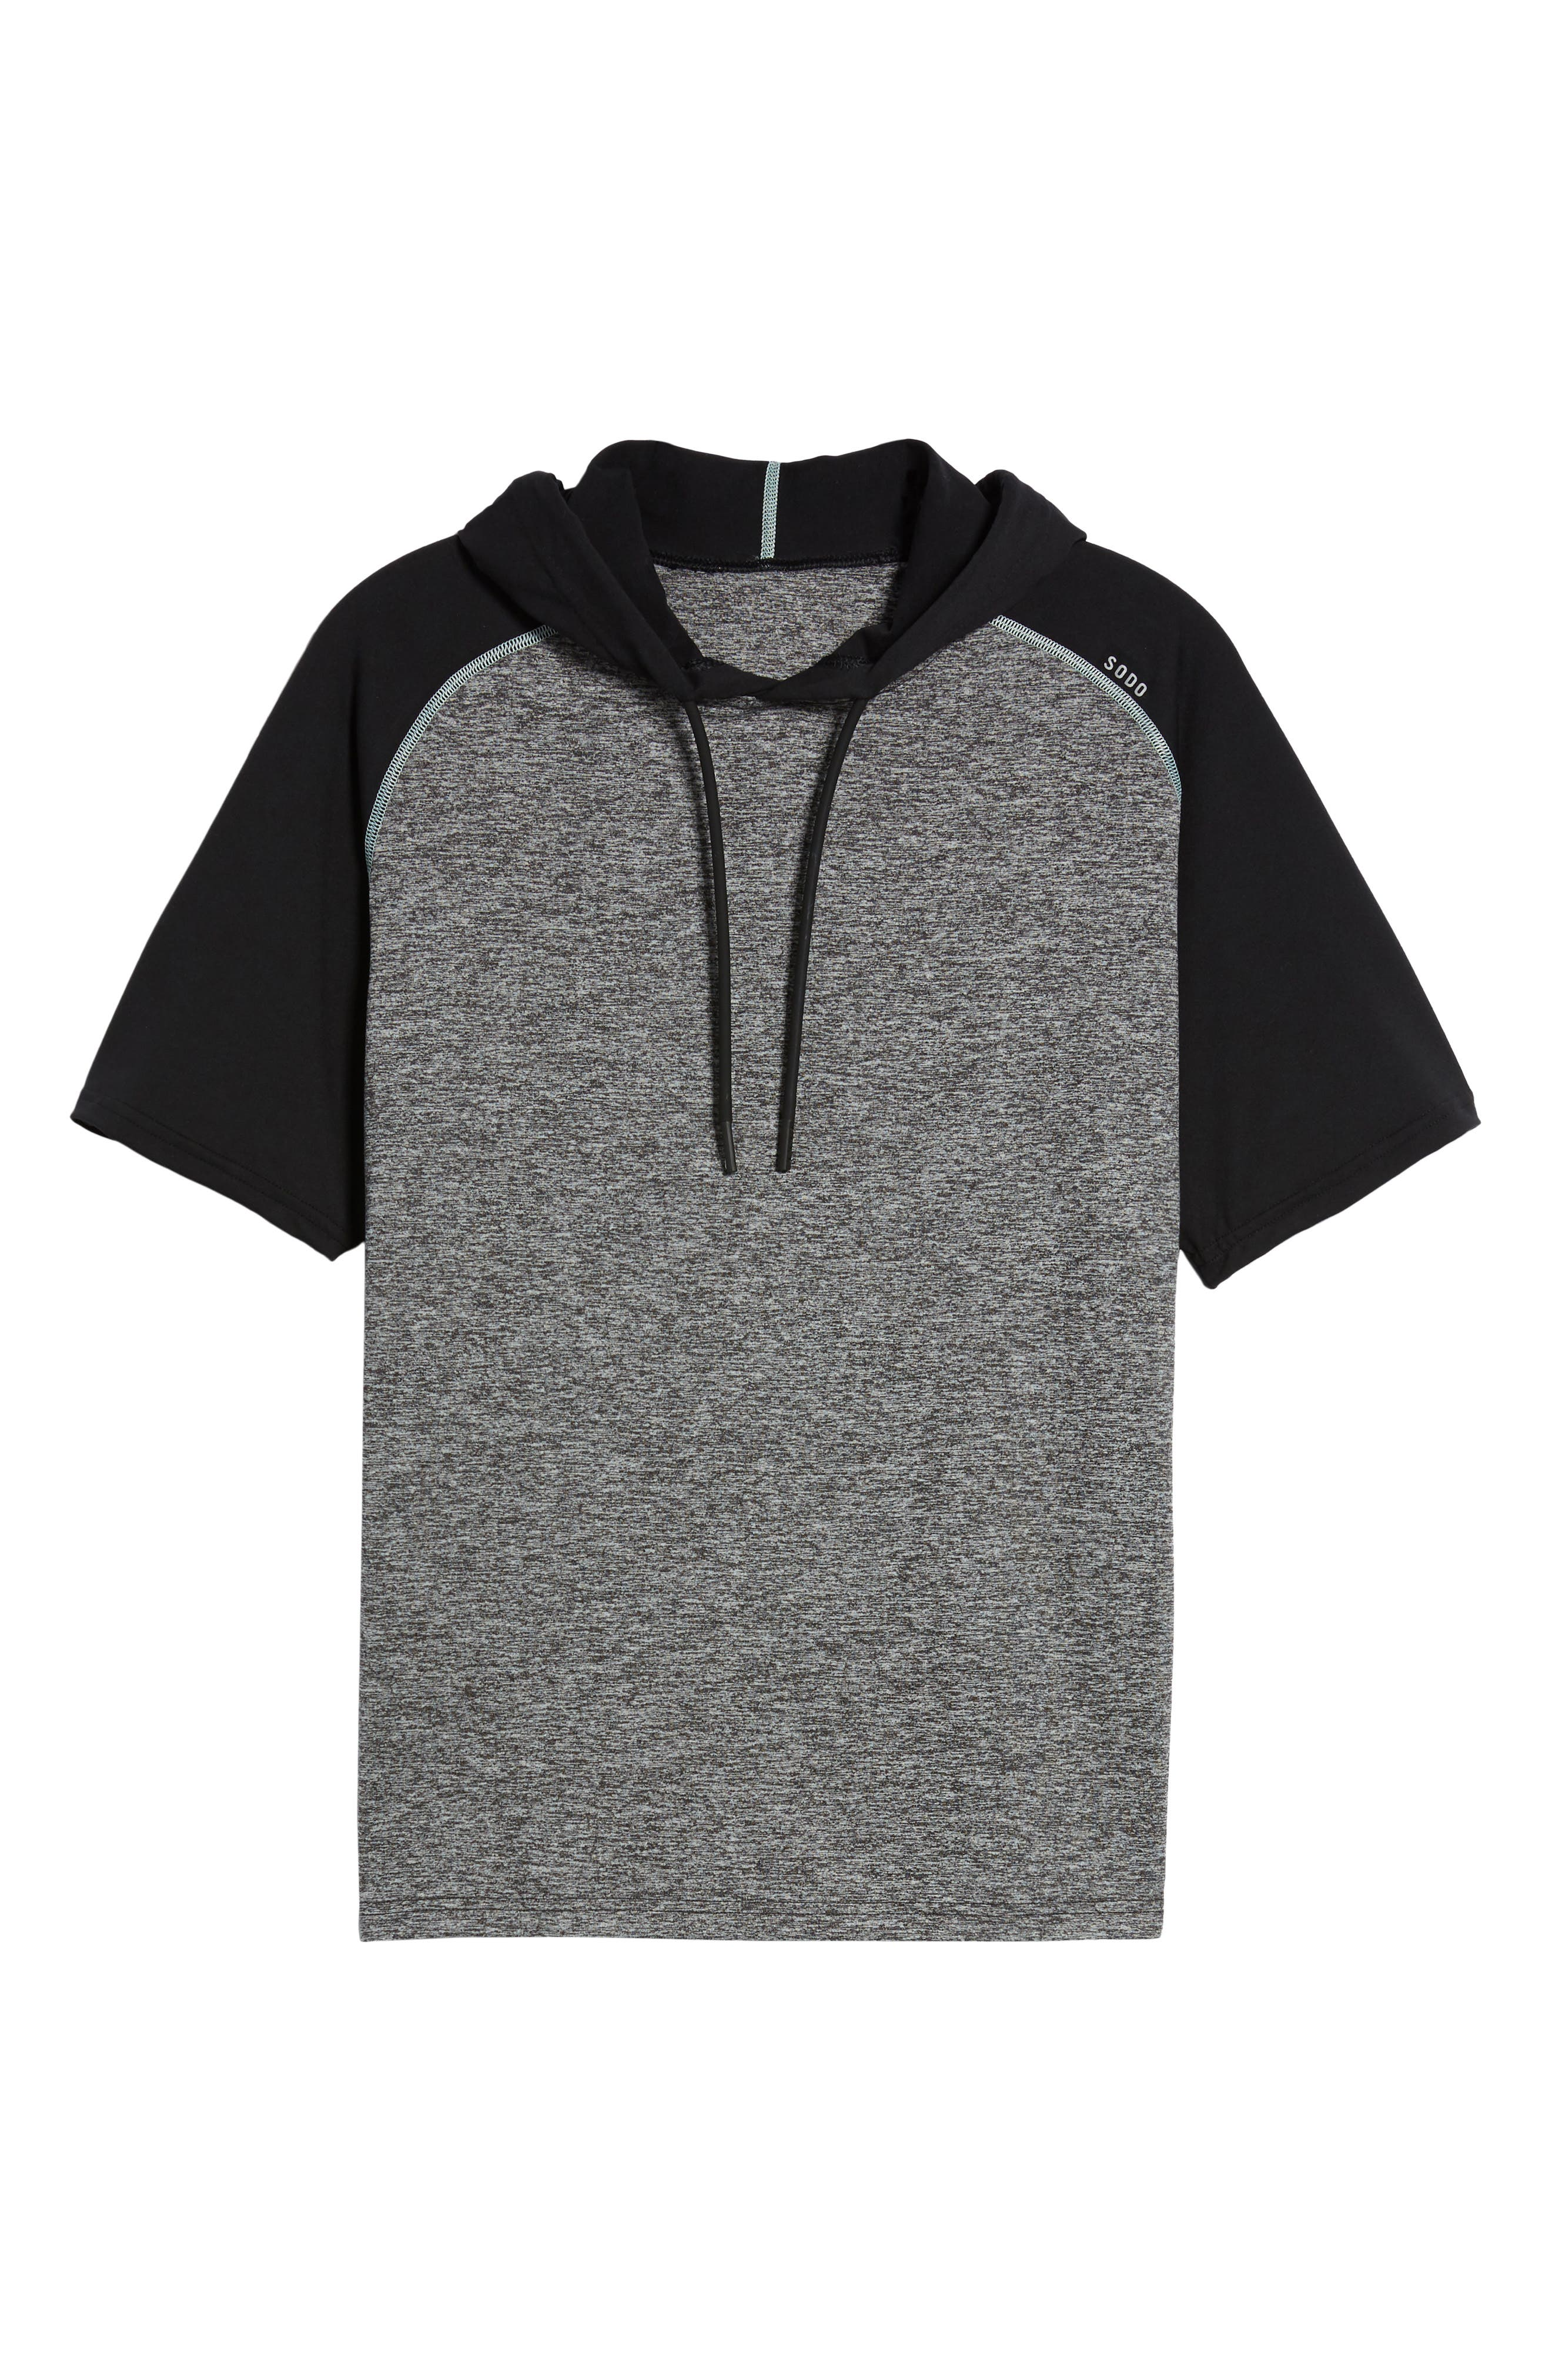 Quad Short Sleeve Hoodie,                             Alternate thumbnail 6, color,                             HEATHER BLACK/ BLACK/ MINT